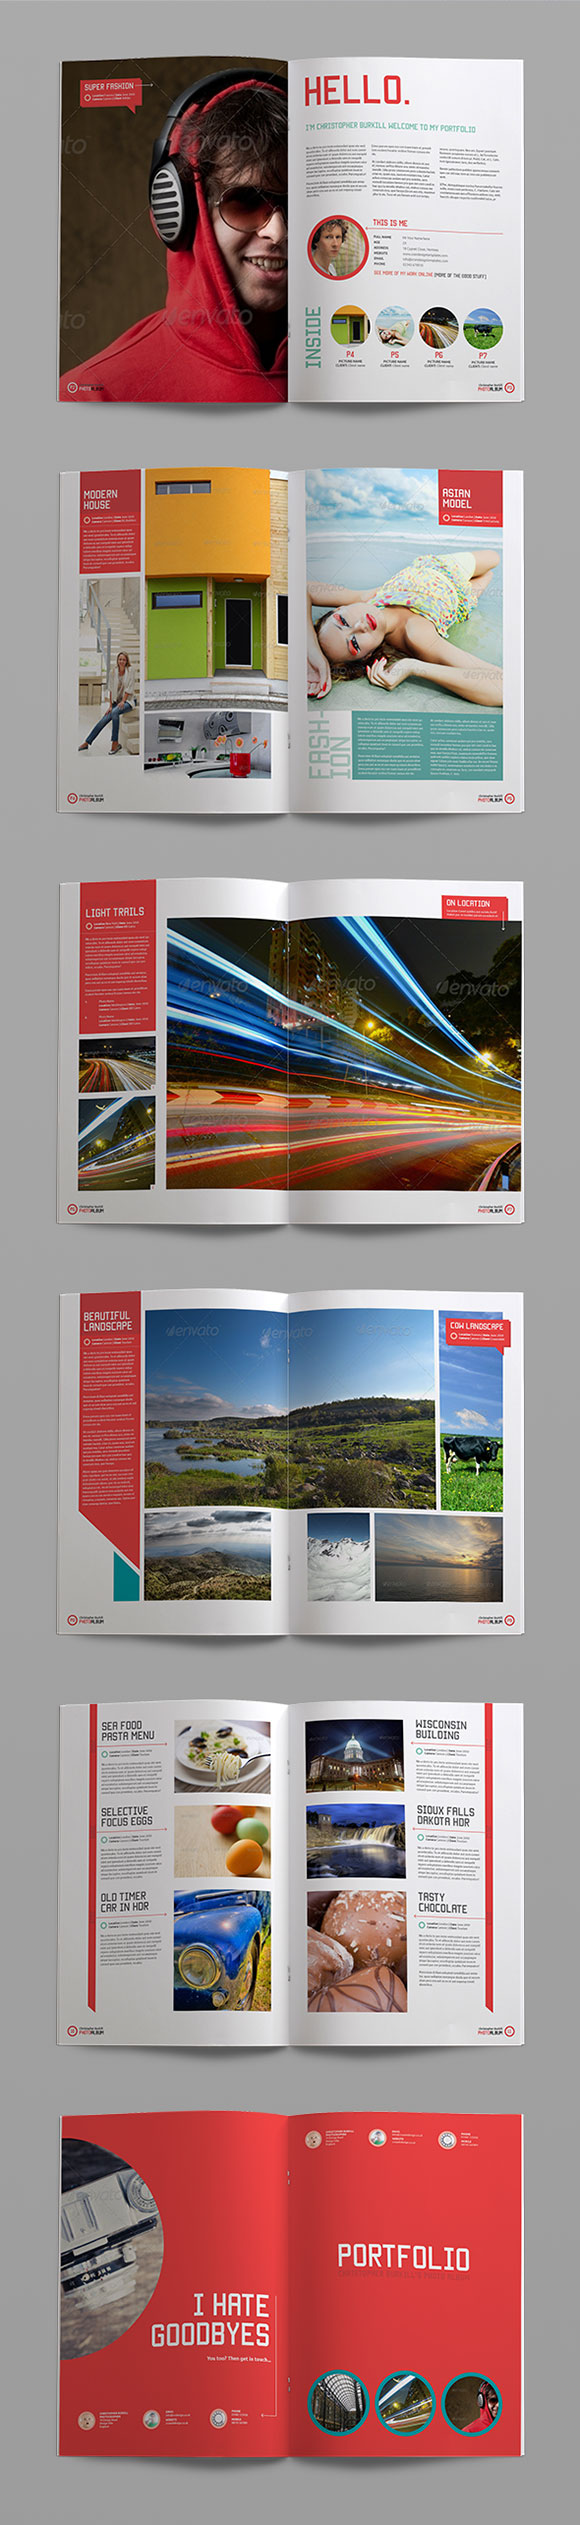 Sleek photo album indesign portfolio template crs for Free indesign portfolio layout templates